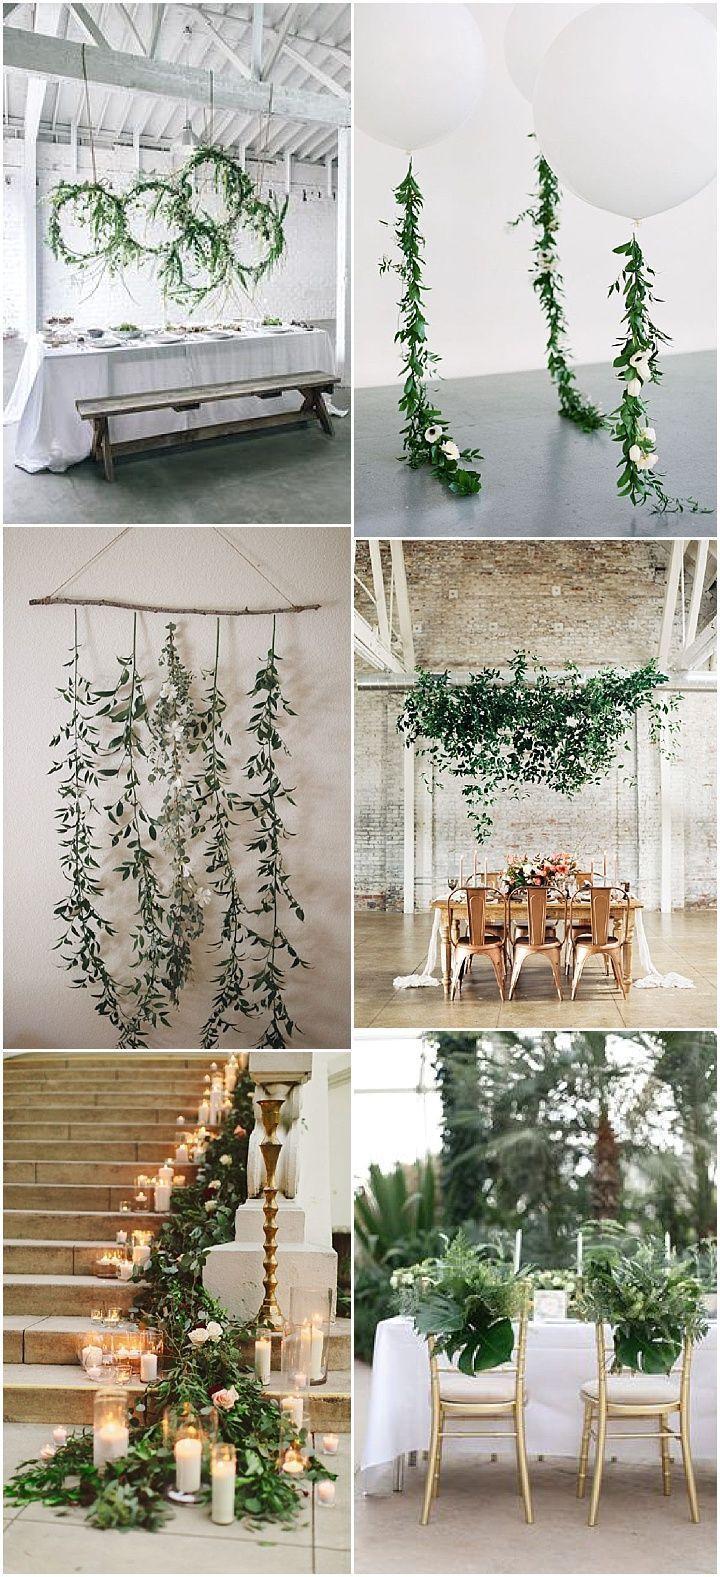 Wedding decorations at home january 2019  Bohemian Home Decor ueue For More Bohemian Home Decor